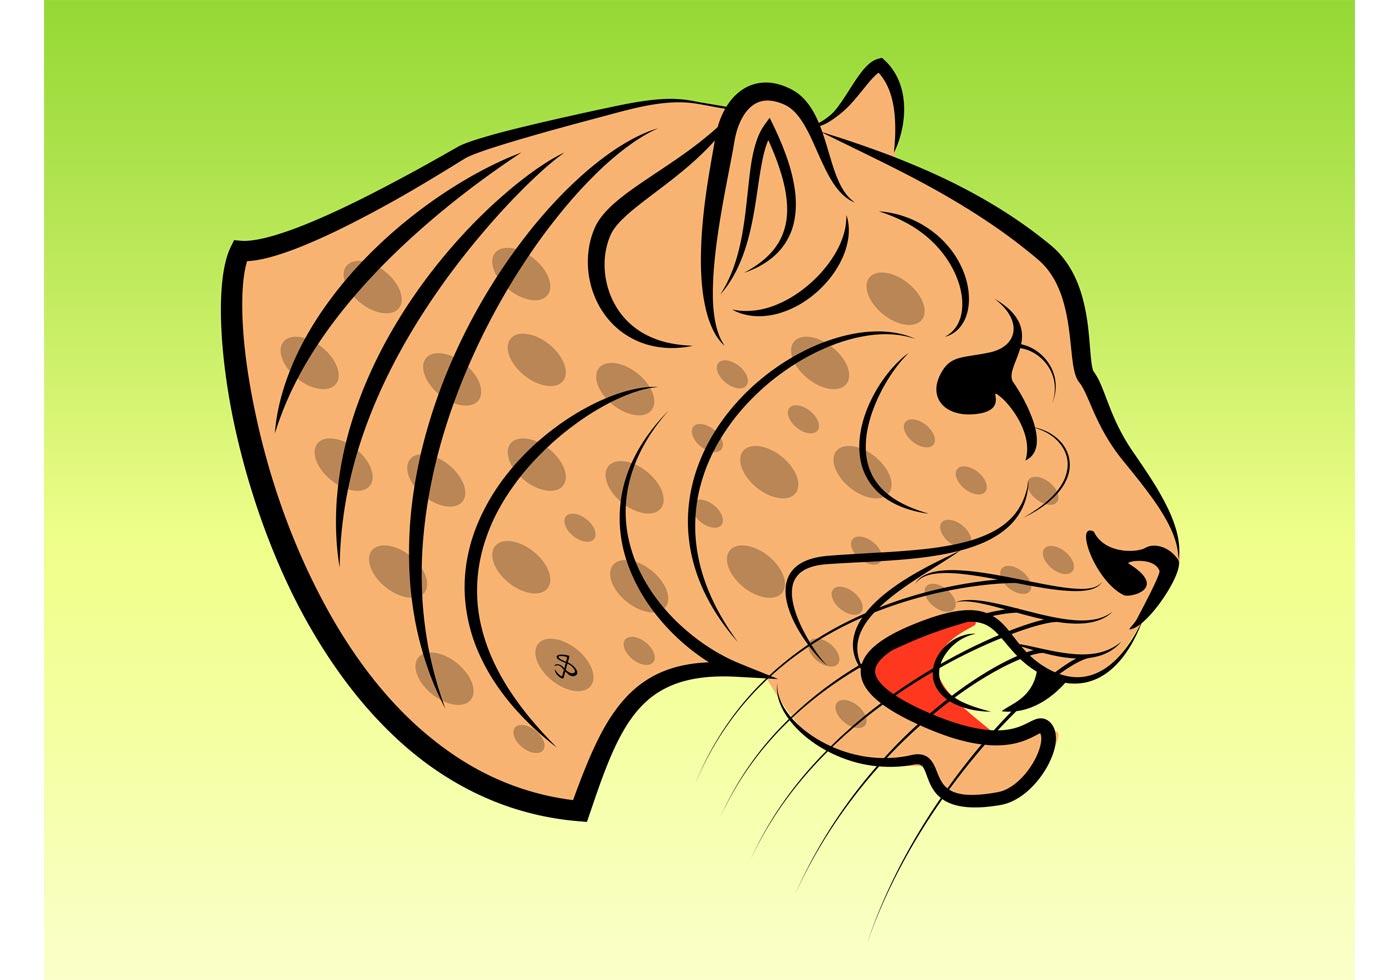 Jaguar Vector Clip Art - Download Free Vector Art, Stock ...